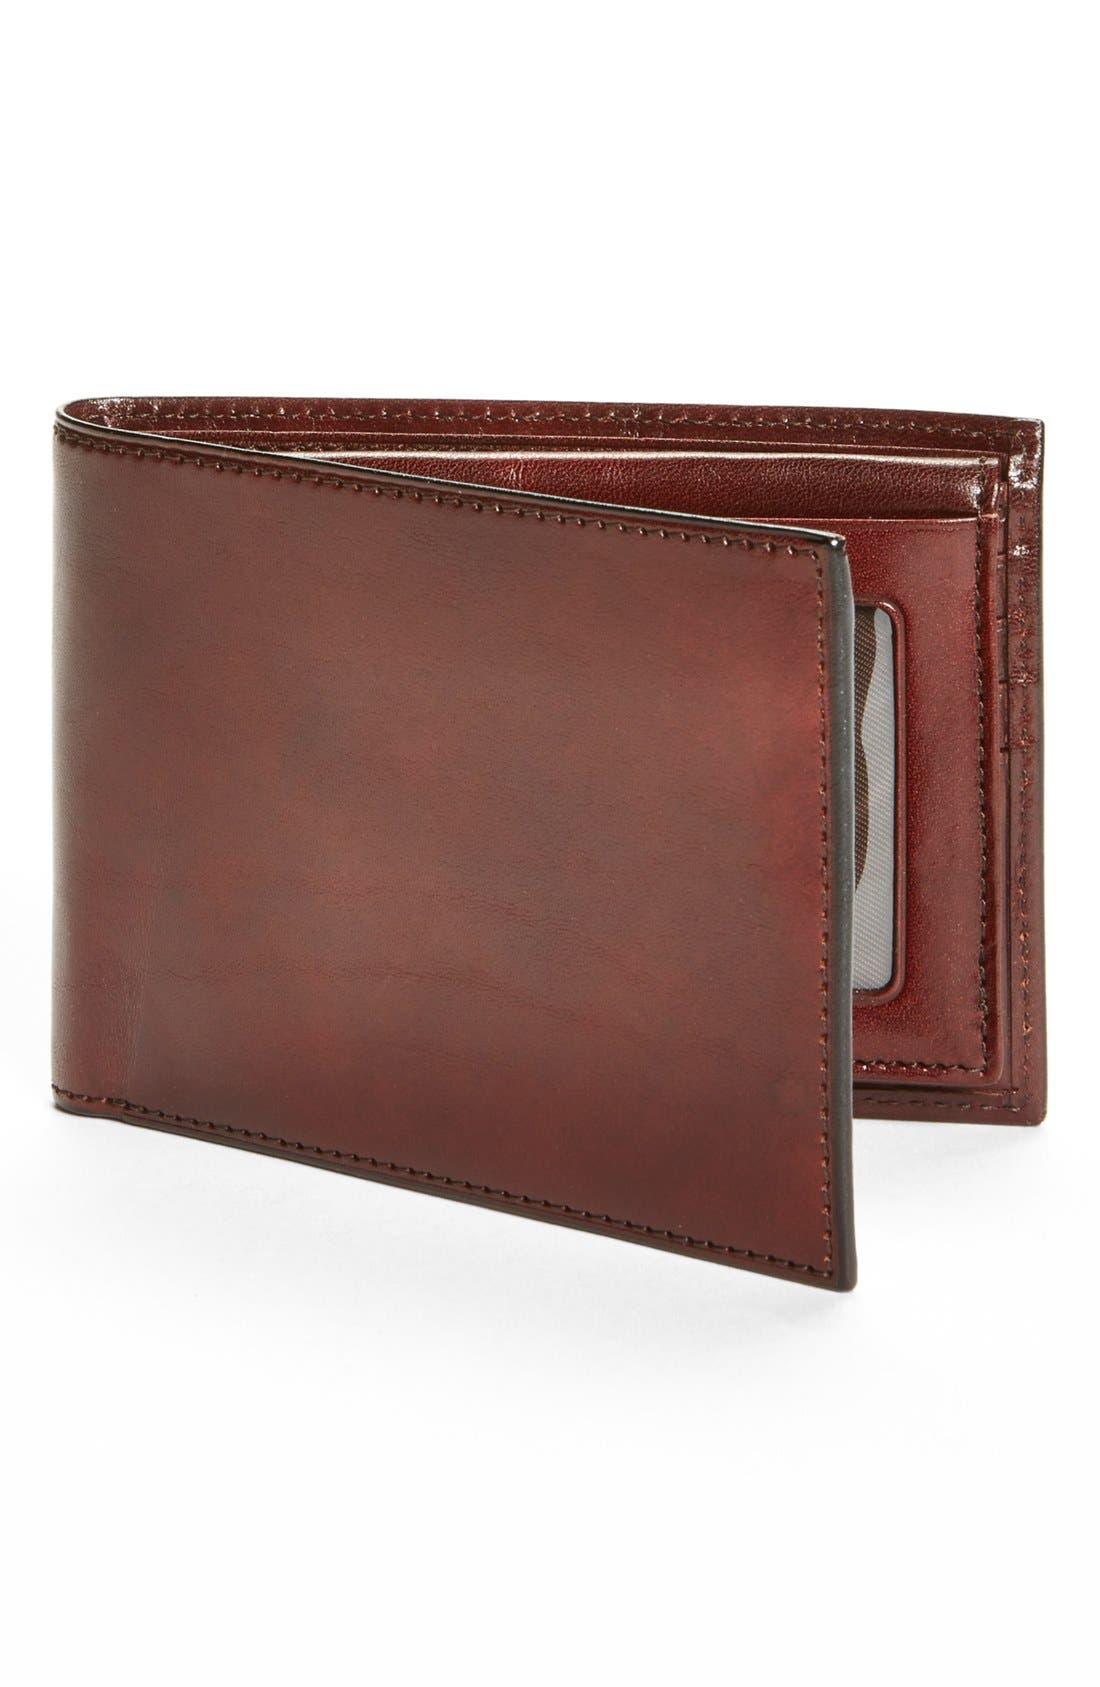 BOSCA, ID Passcase Wallet, Main thumbnail 1, color, BROWN